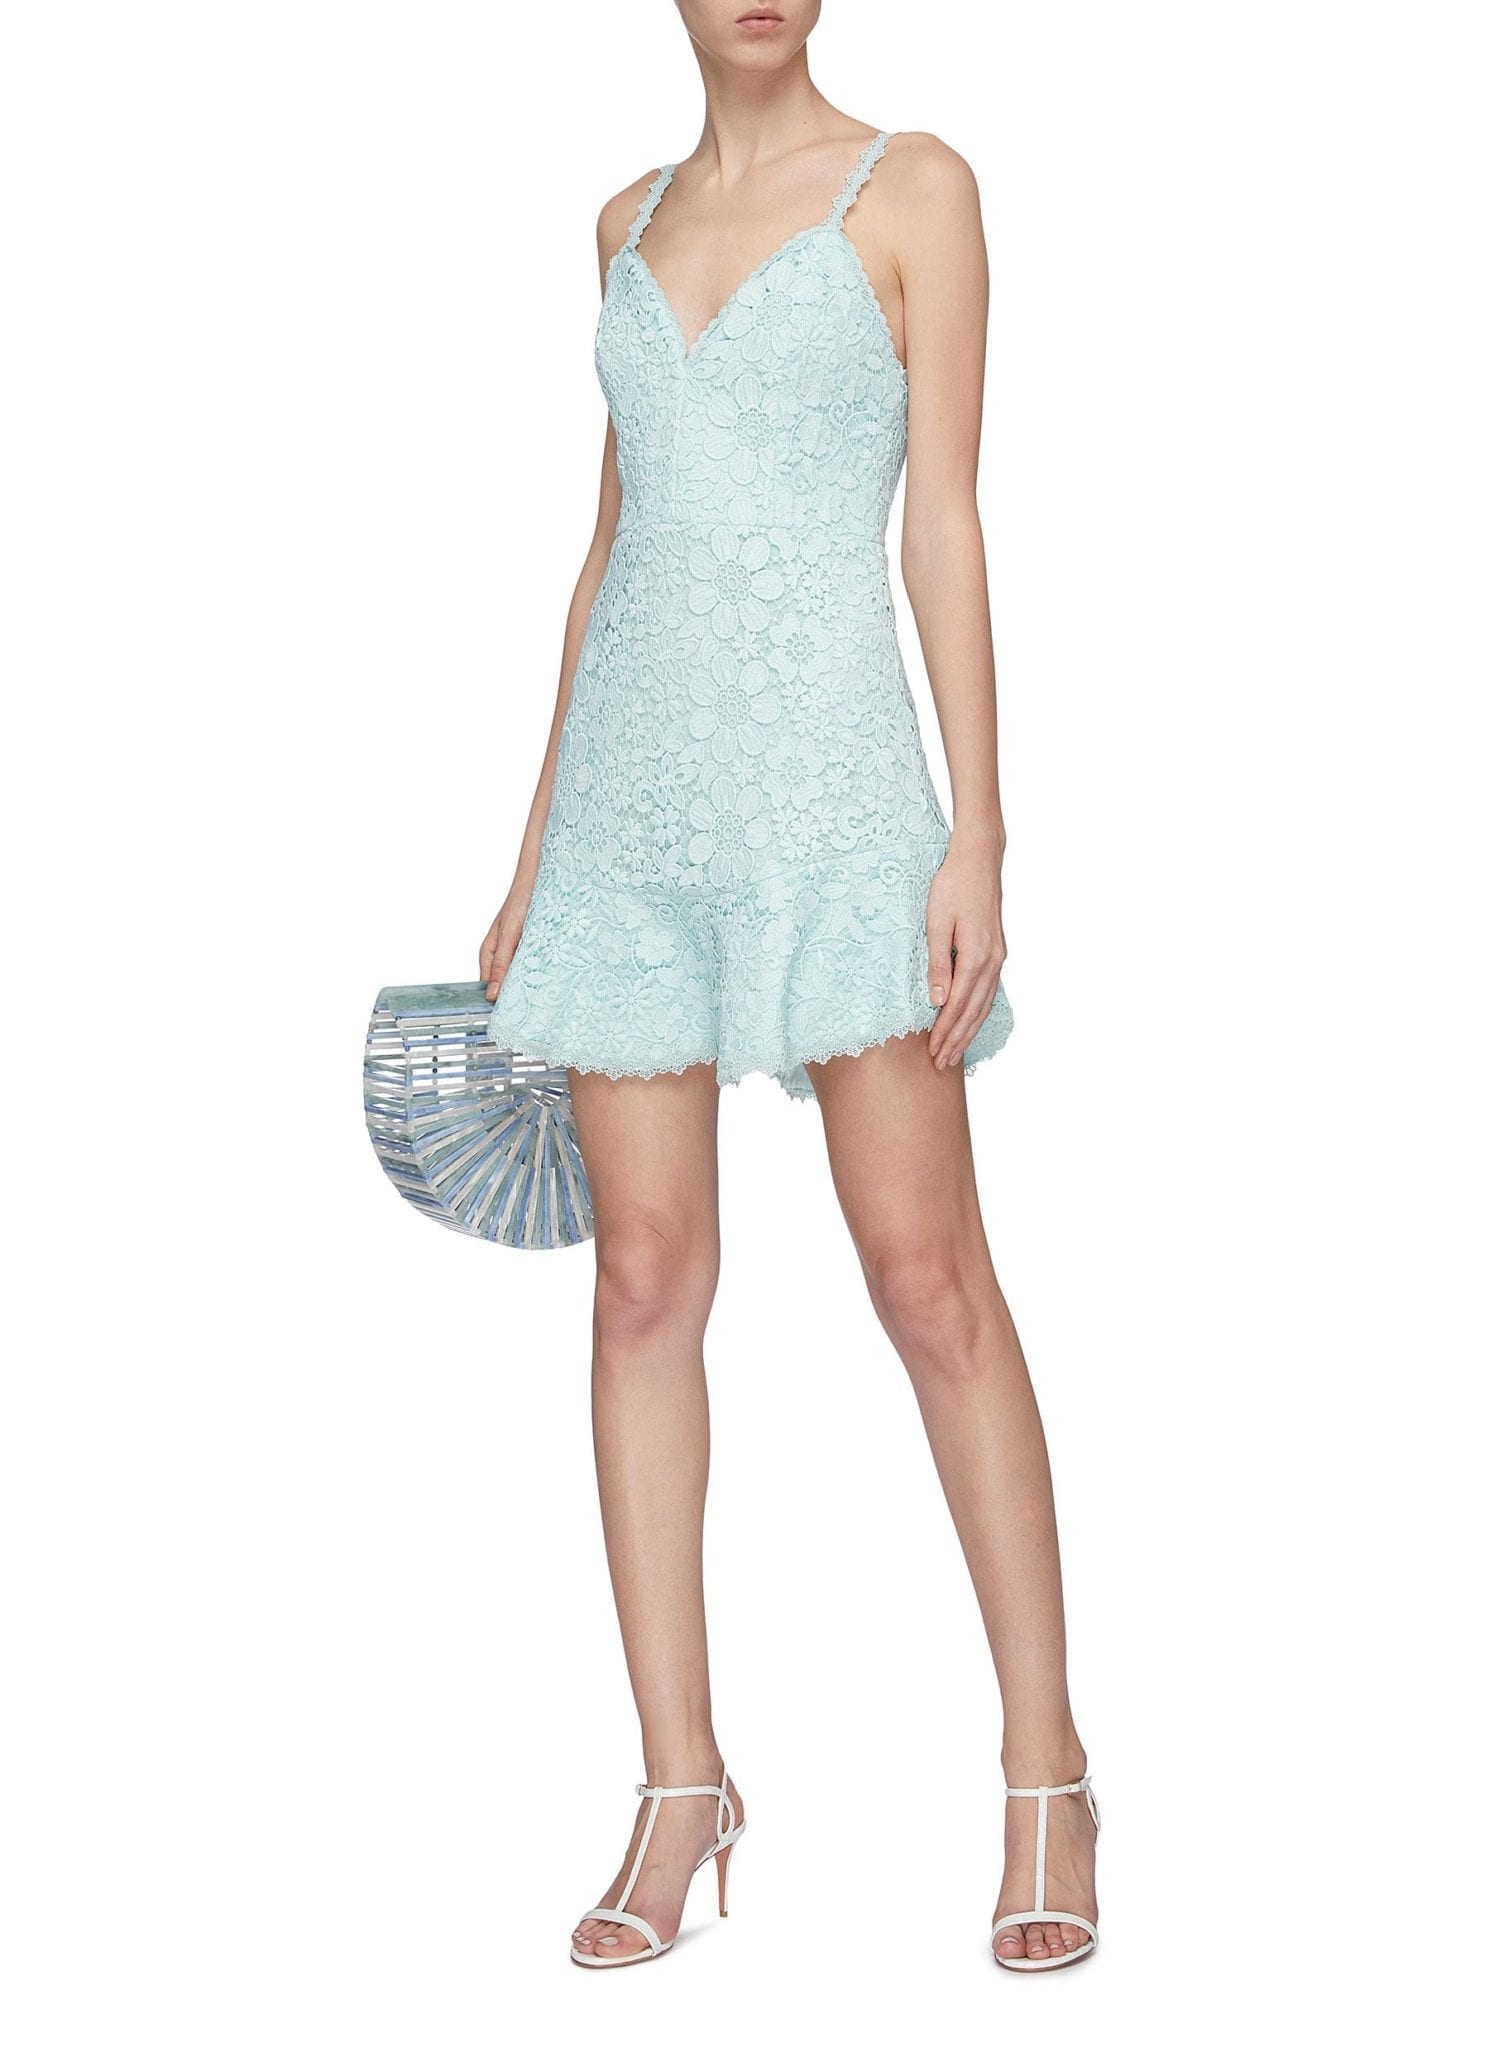 ALICE + OLIVIA 'Rapunzel' Guipure Lace Sleeveless Peplum Dress